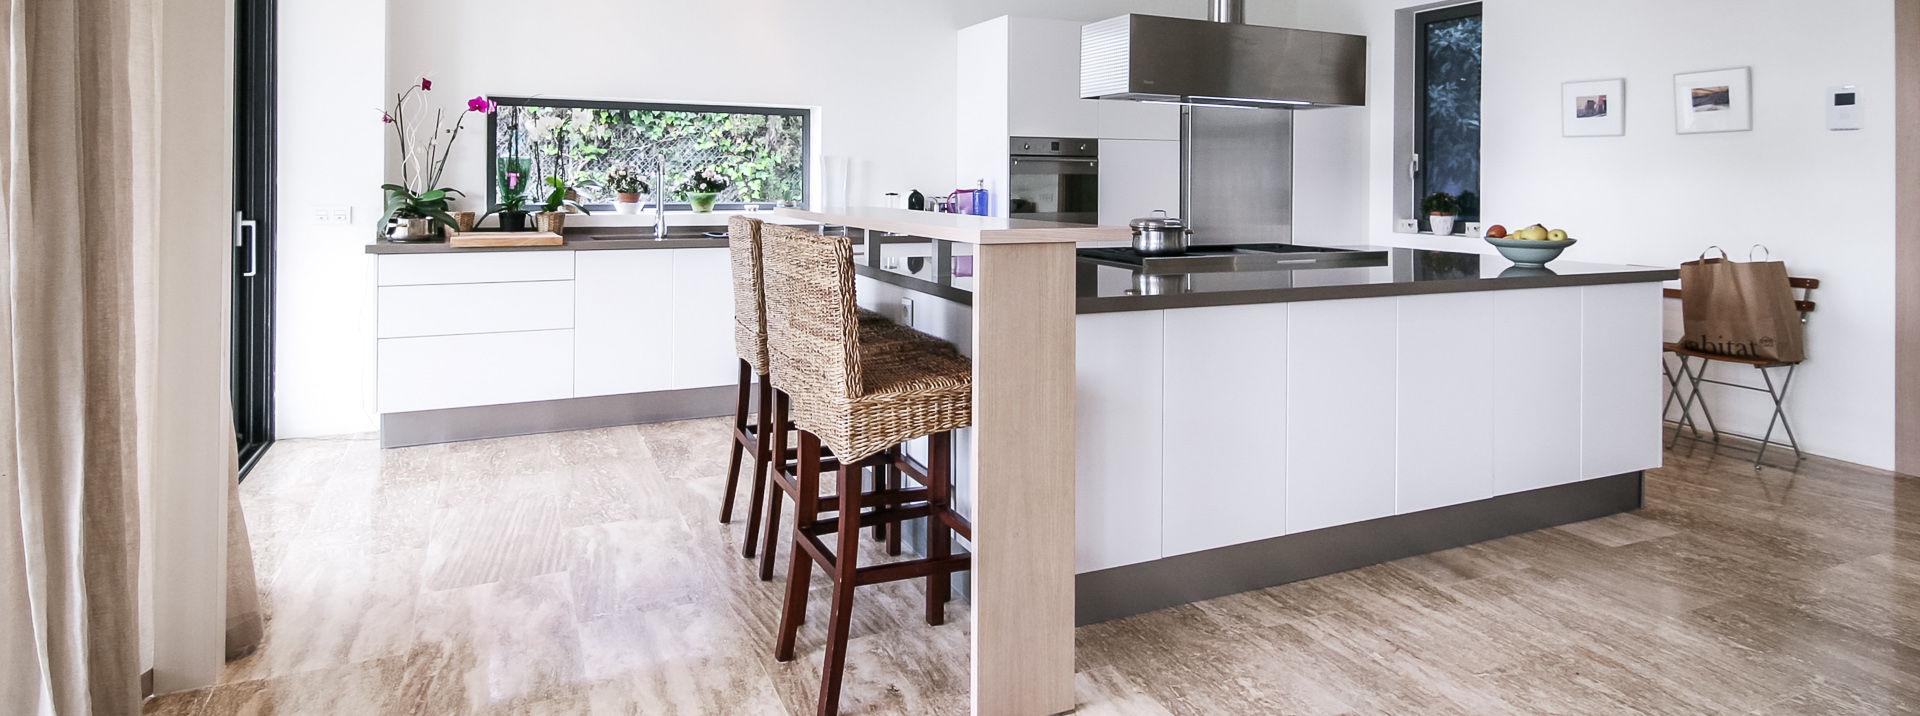 Nordic Muebles - Kitchens - Modern - Madrid